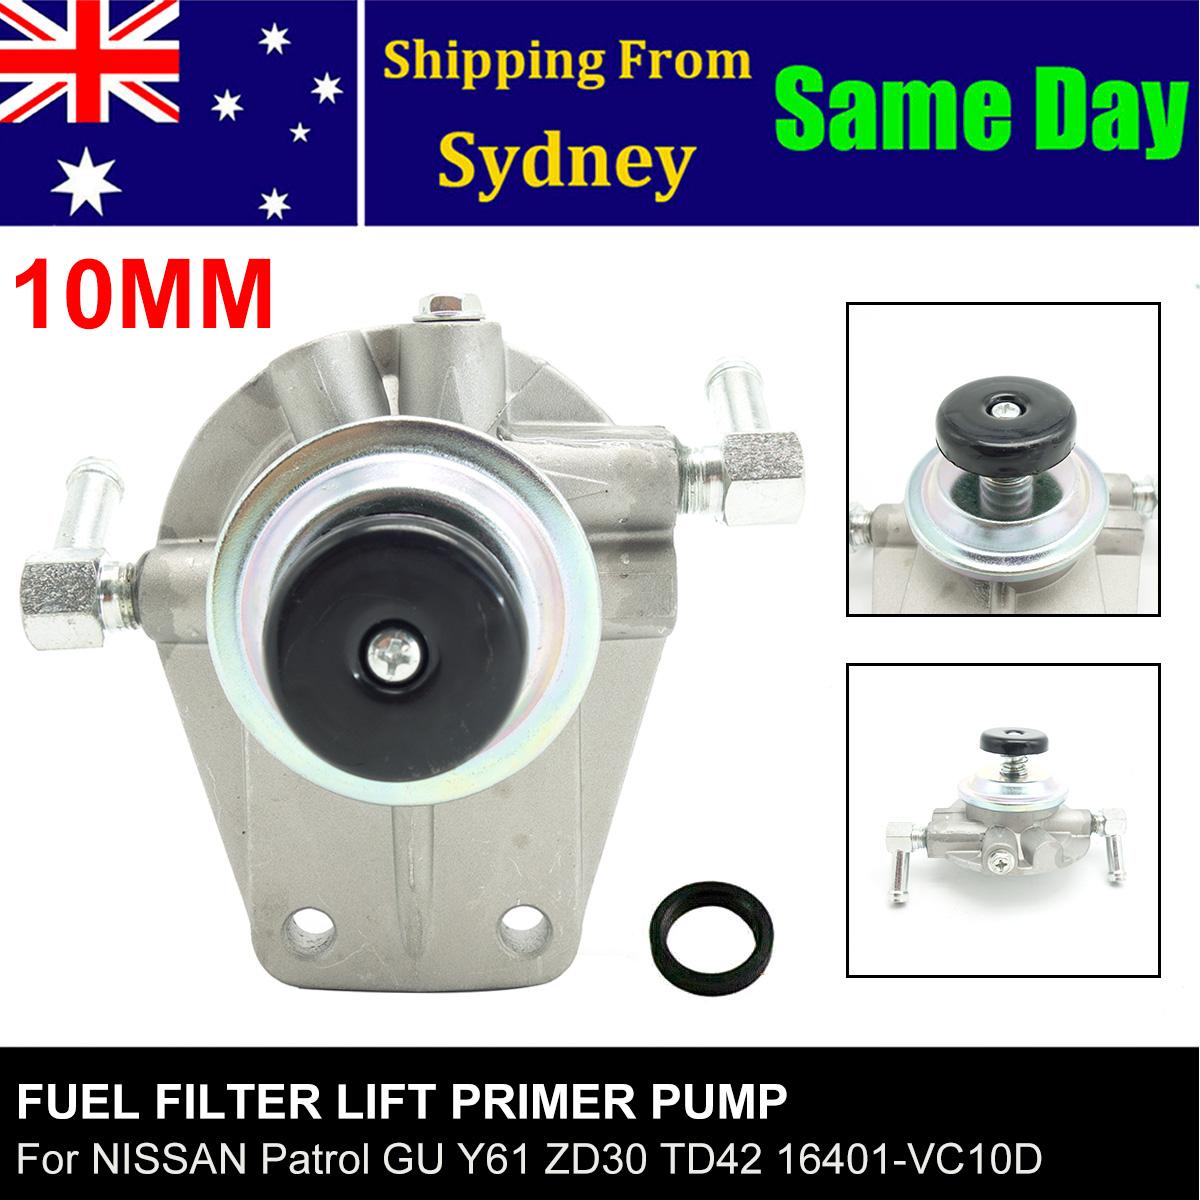 Genuine Patrol GU Y61 ZD30 TD42 Fuel Filter Lift Primer Pump 16401VC10D